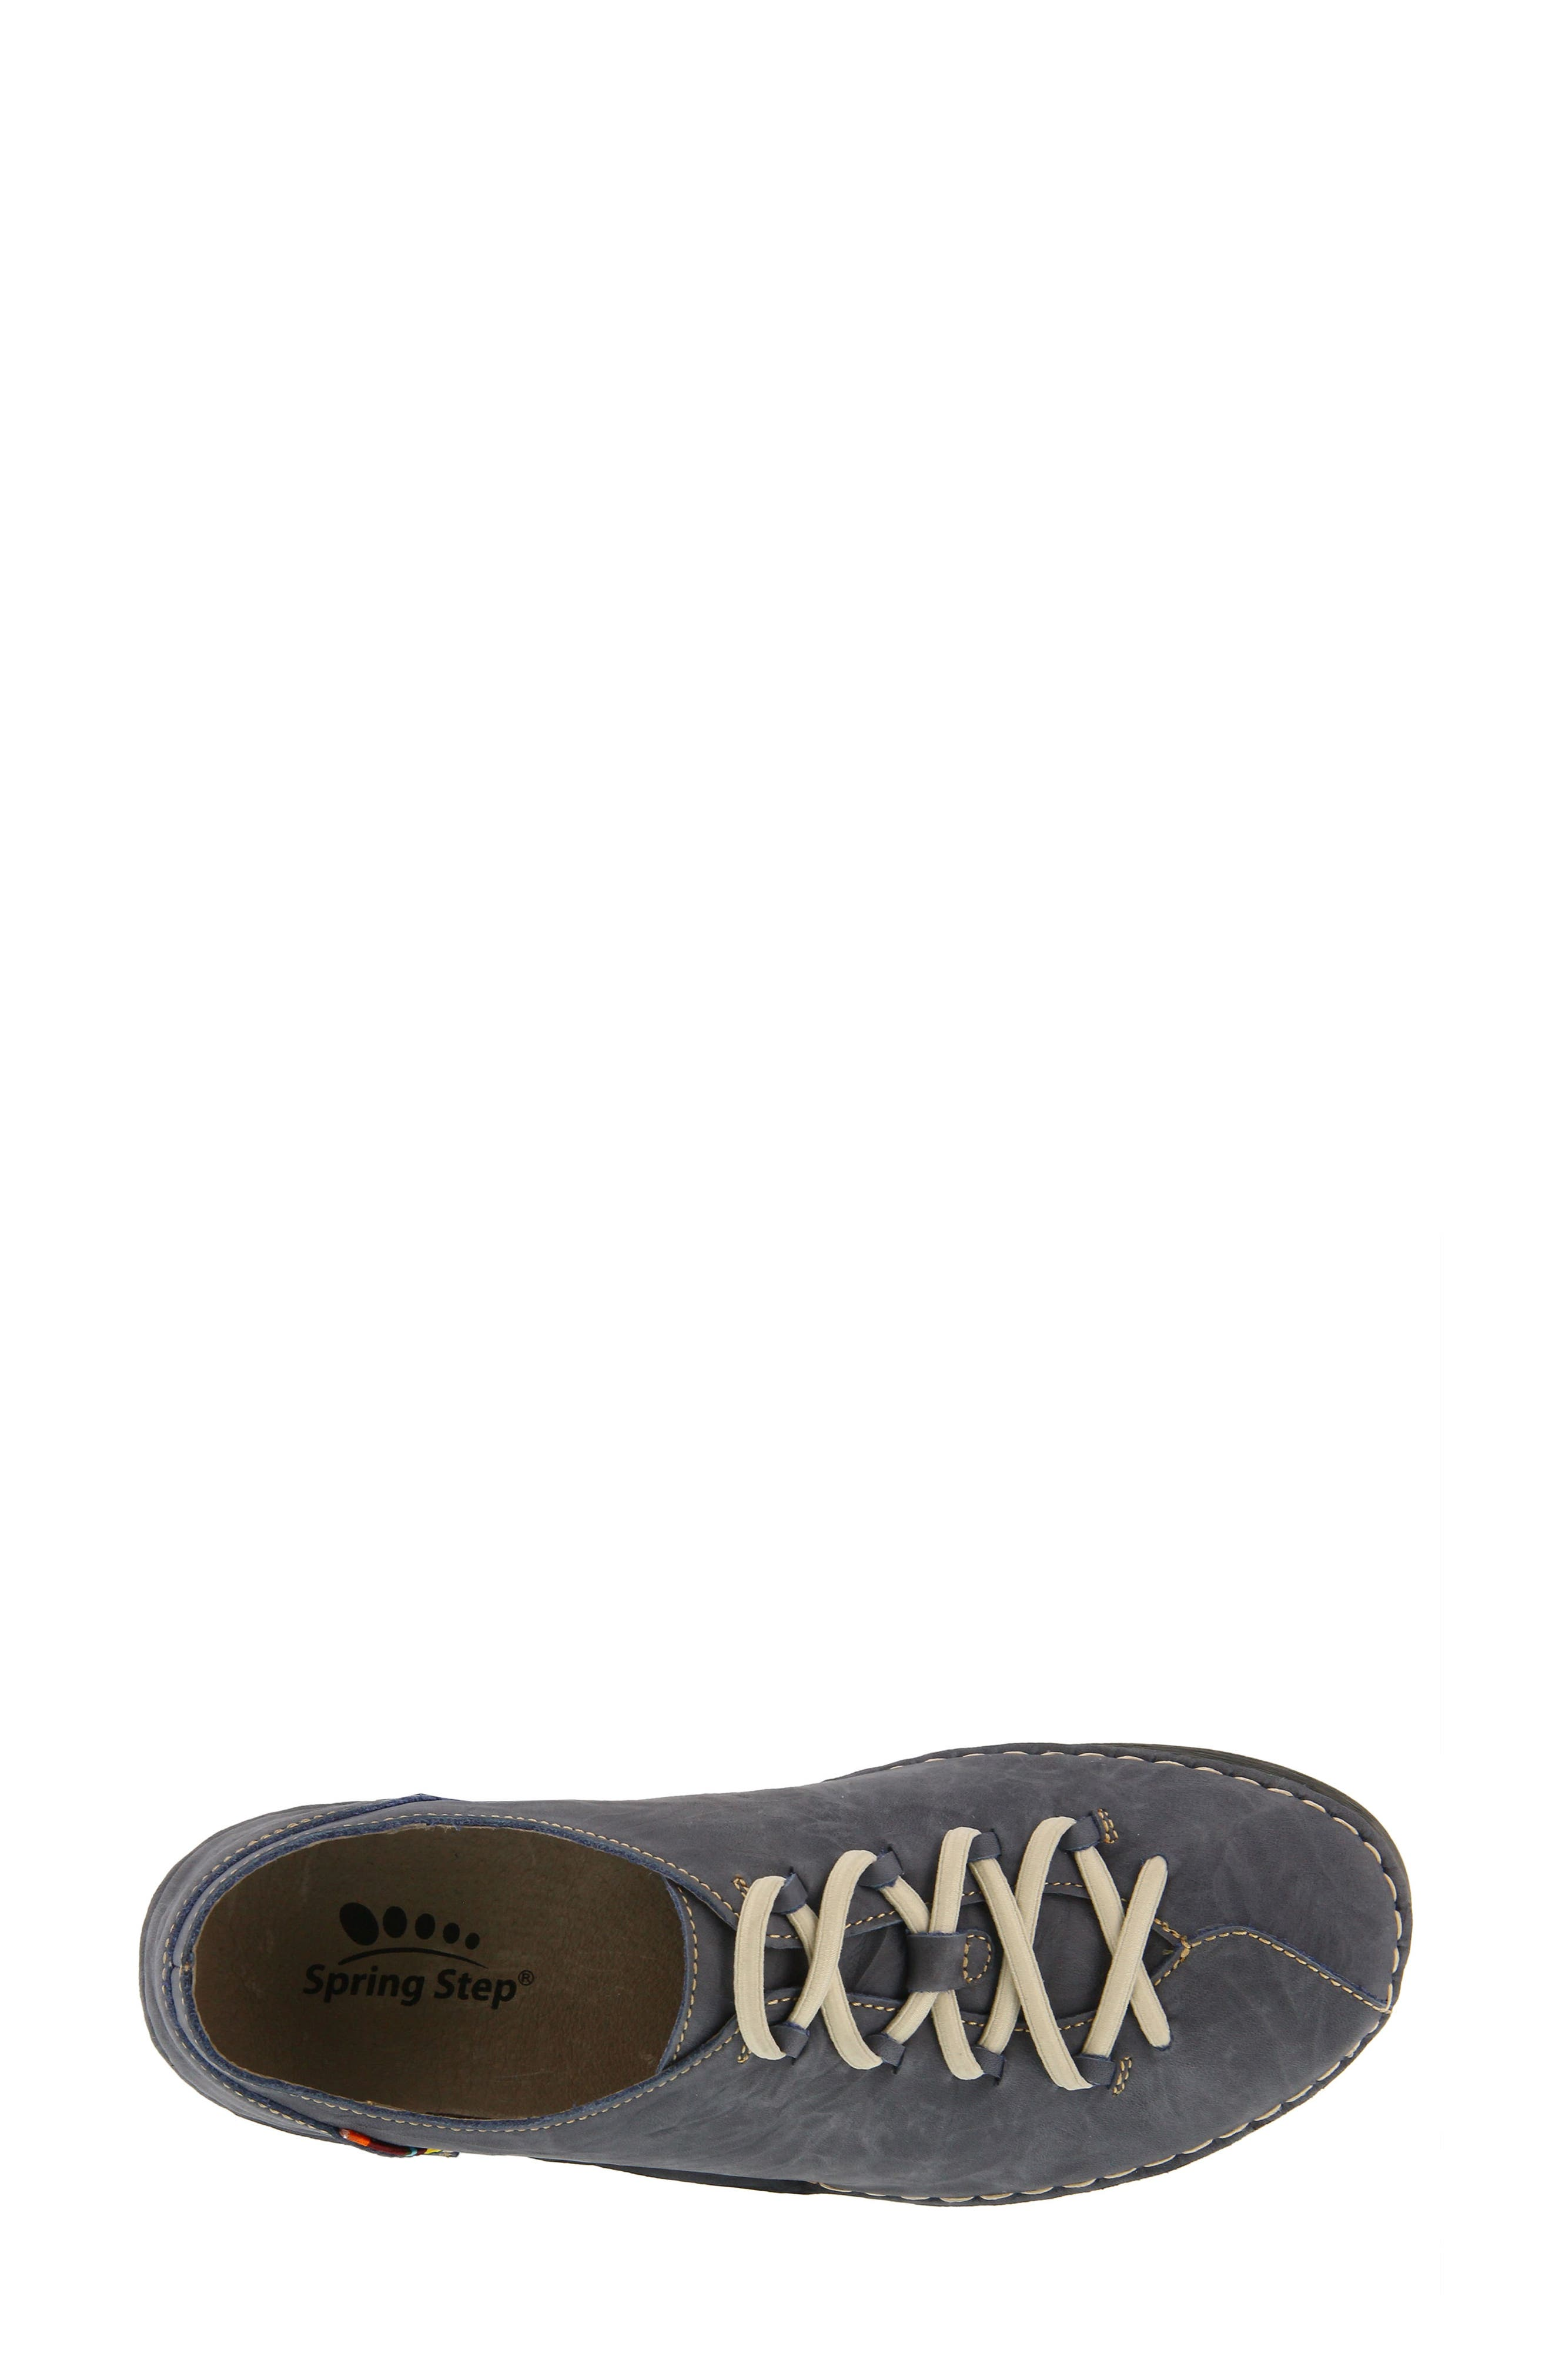 Carhop Sneaker,                             Alternate thumbnail 5, color,                             Blue Leather